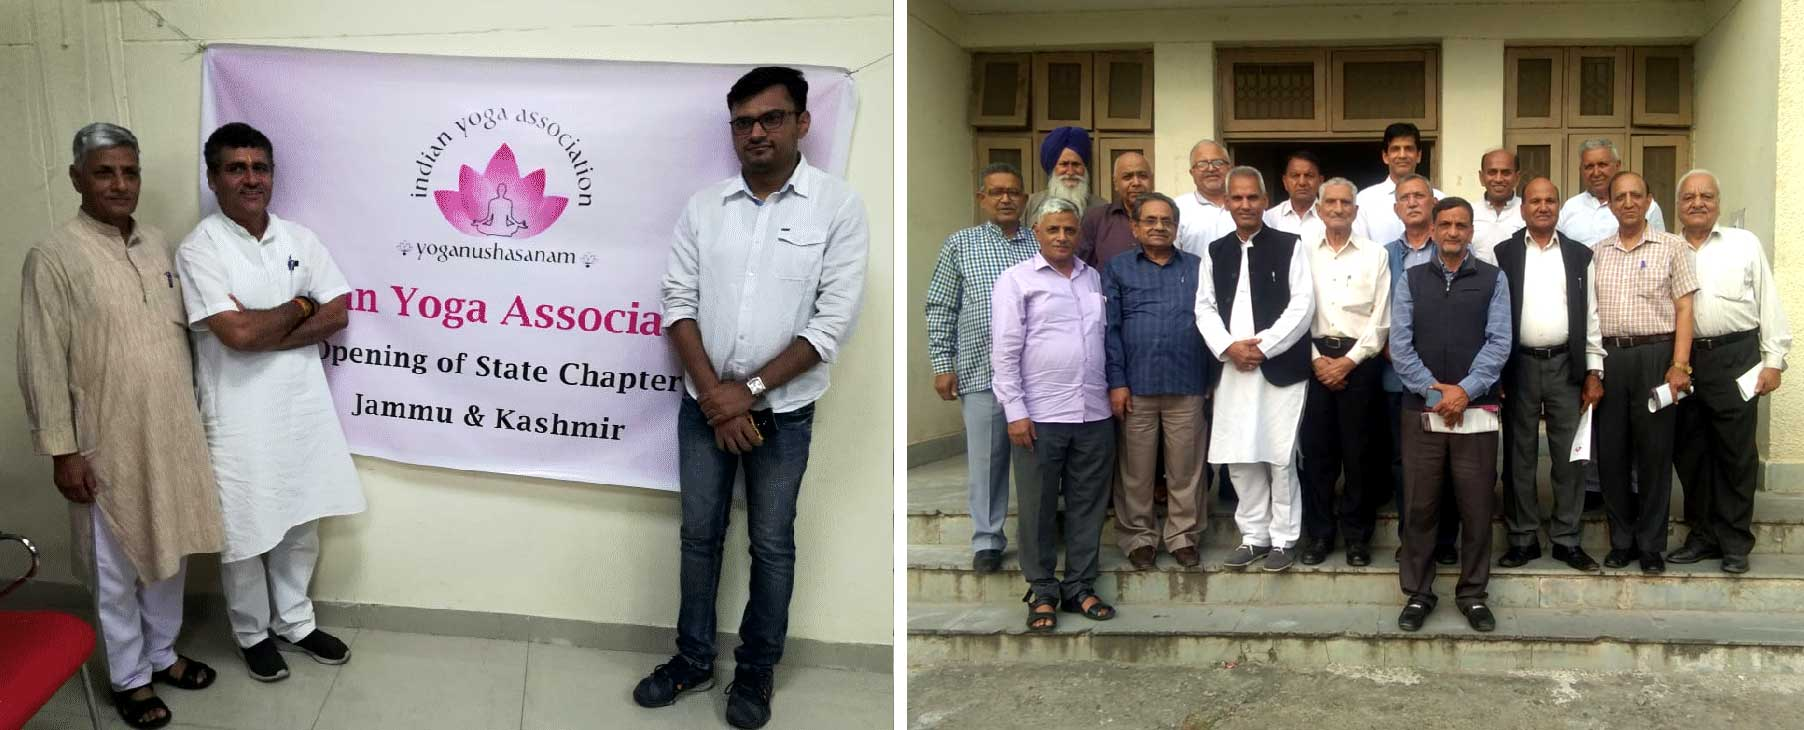 Jammu and Kashmir State Chapter